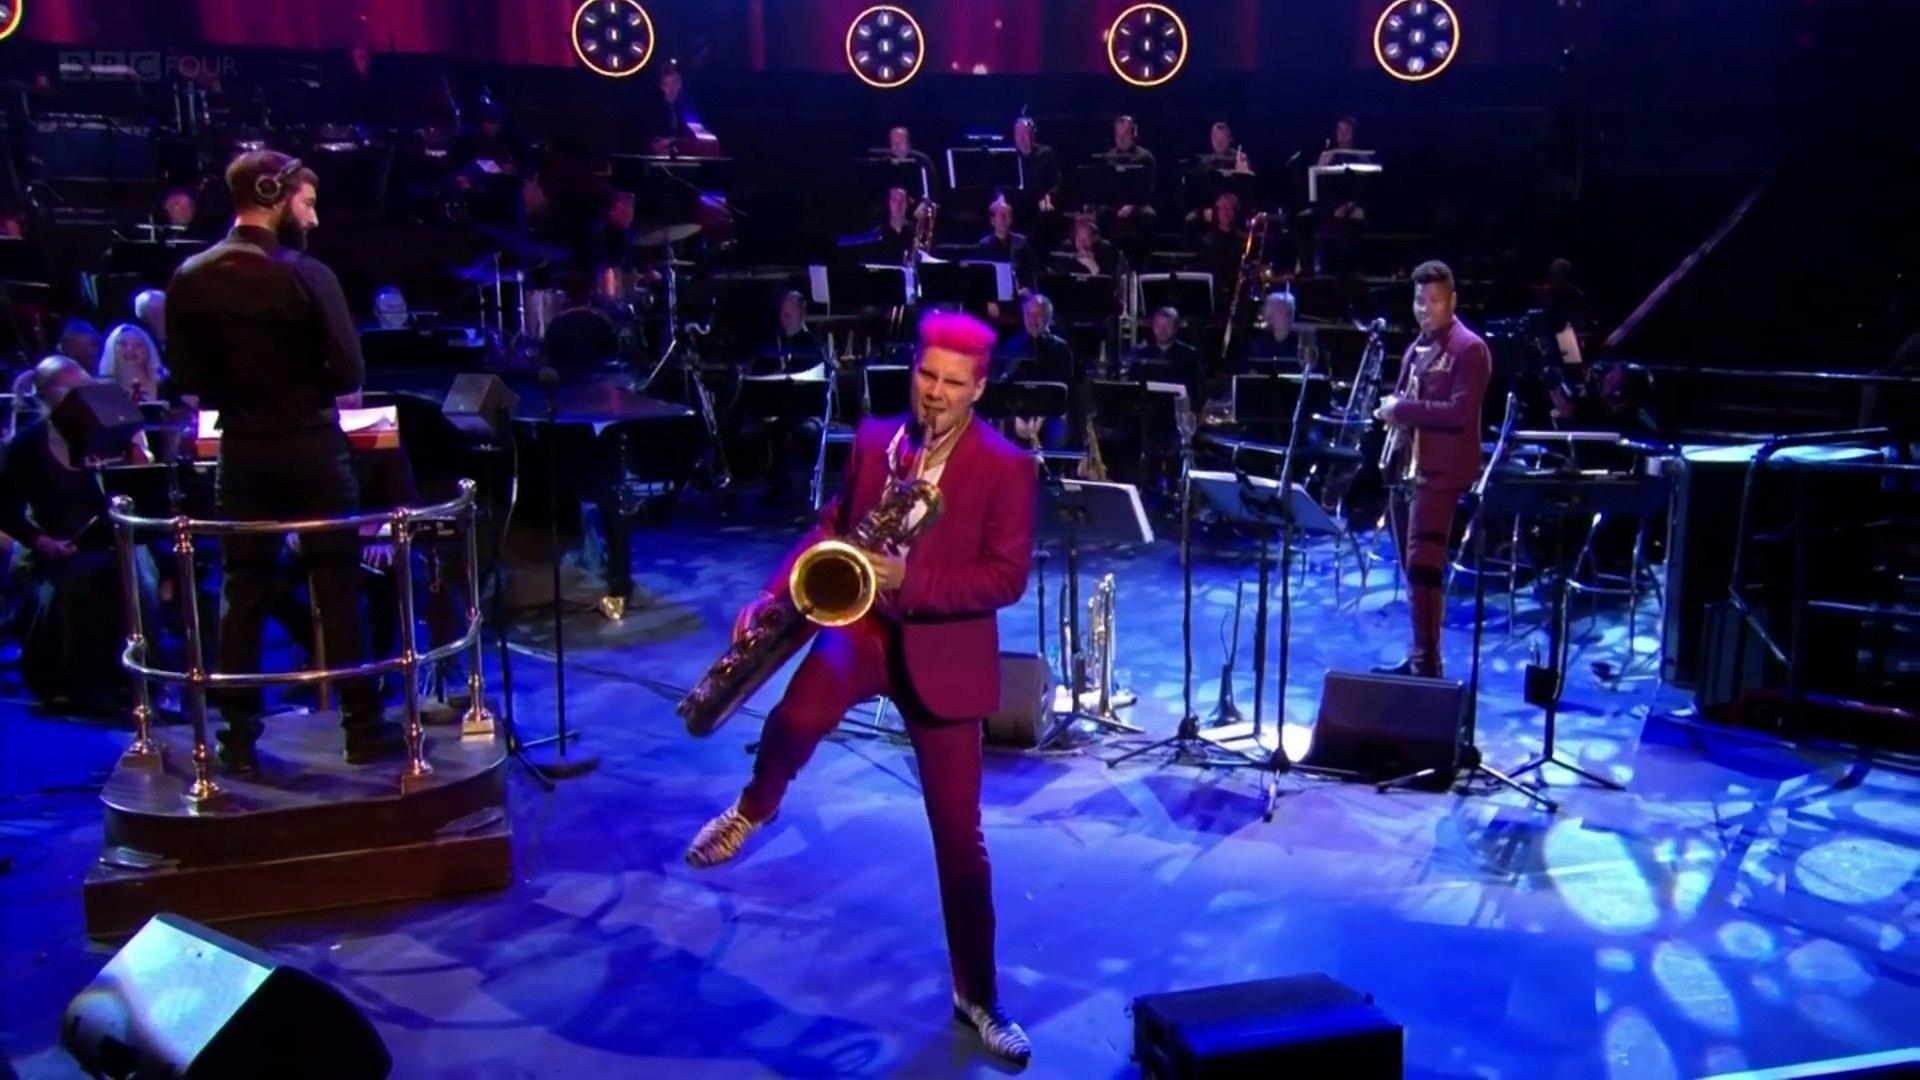 Leo P at the BBC Proms 2017 - Moanin'